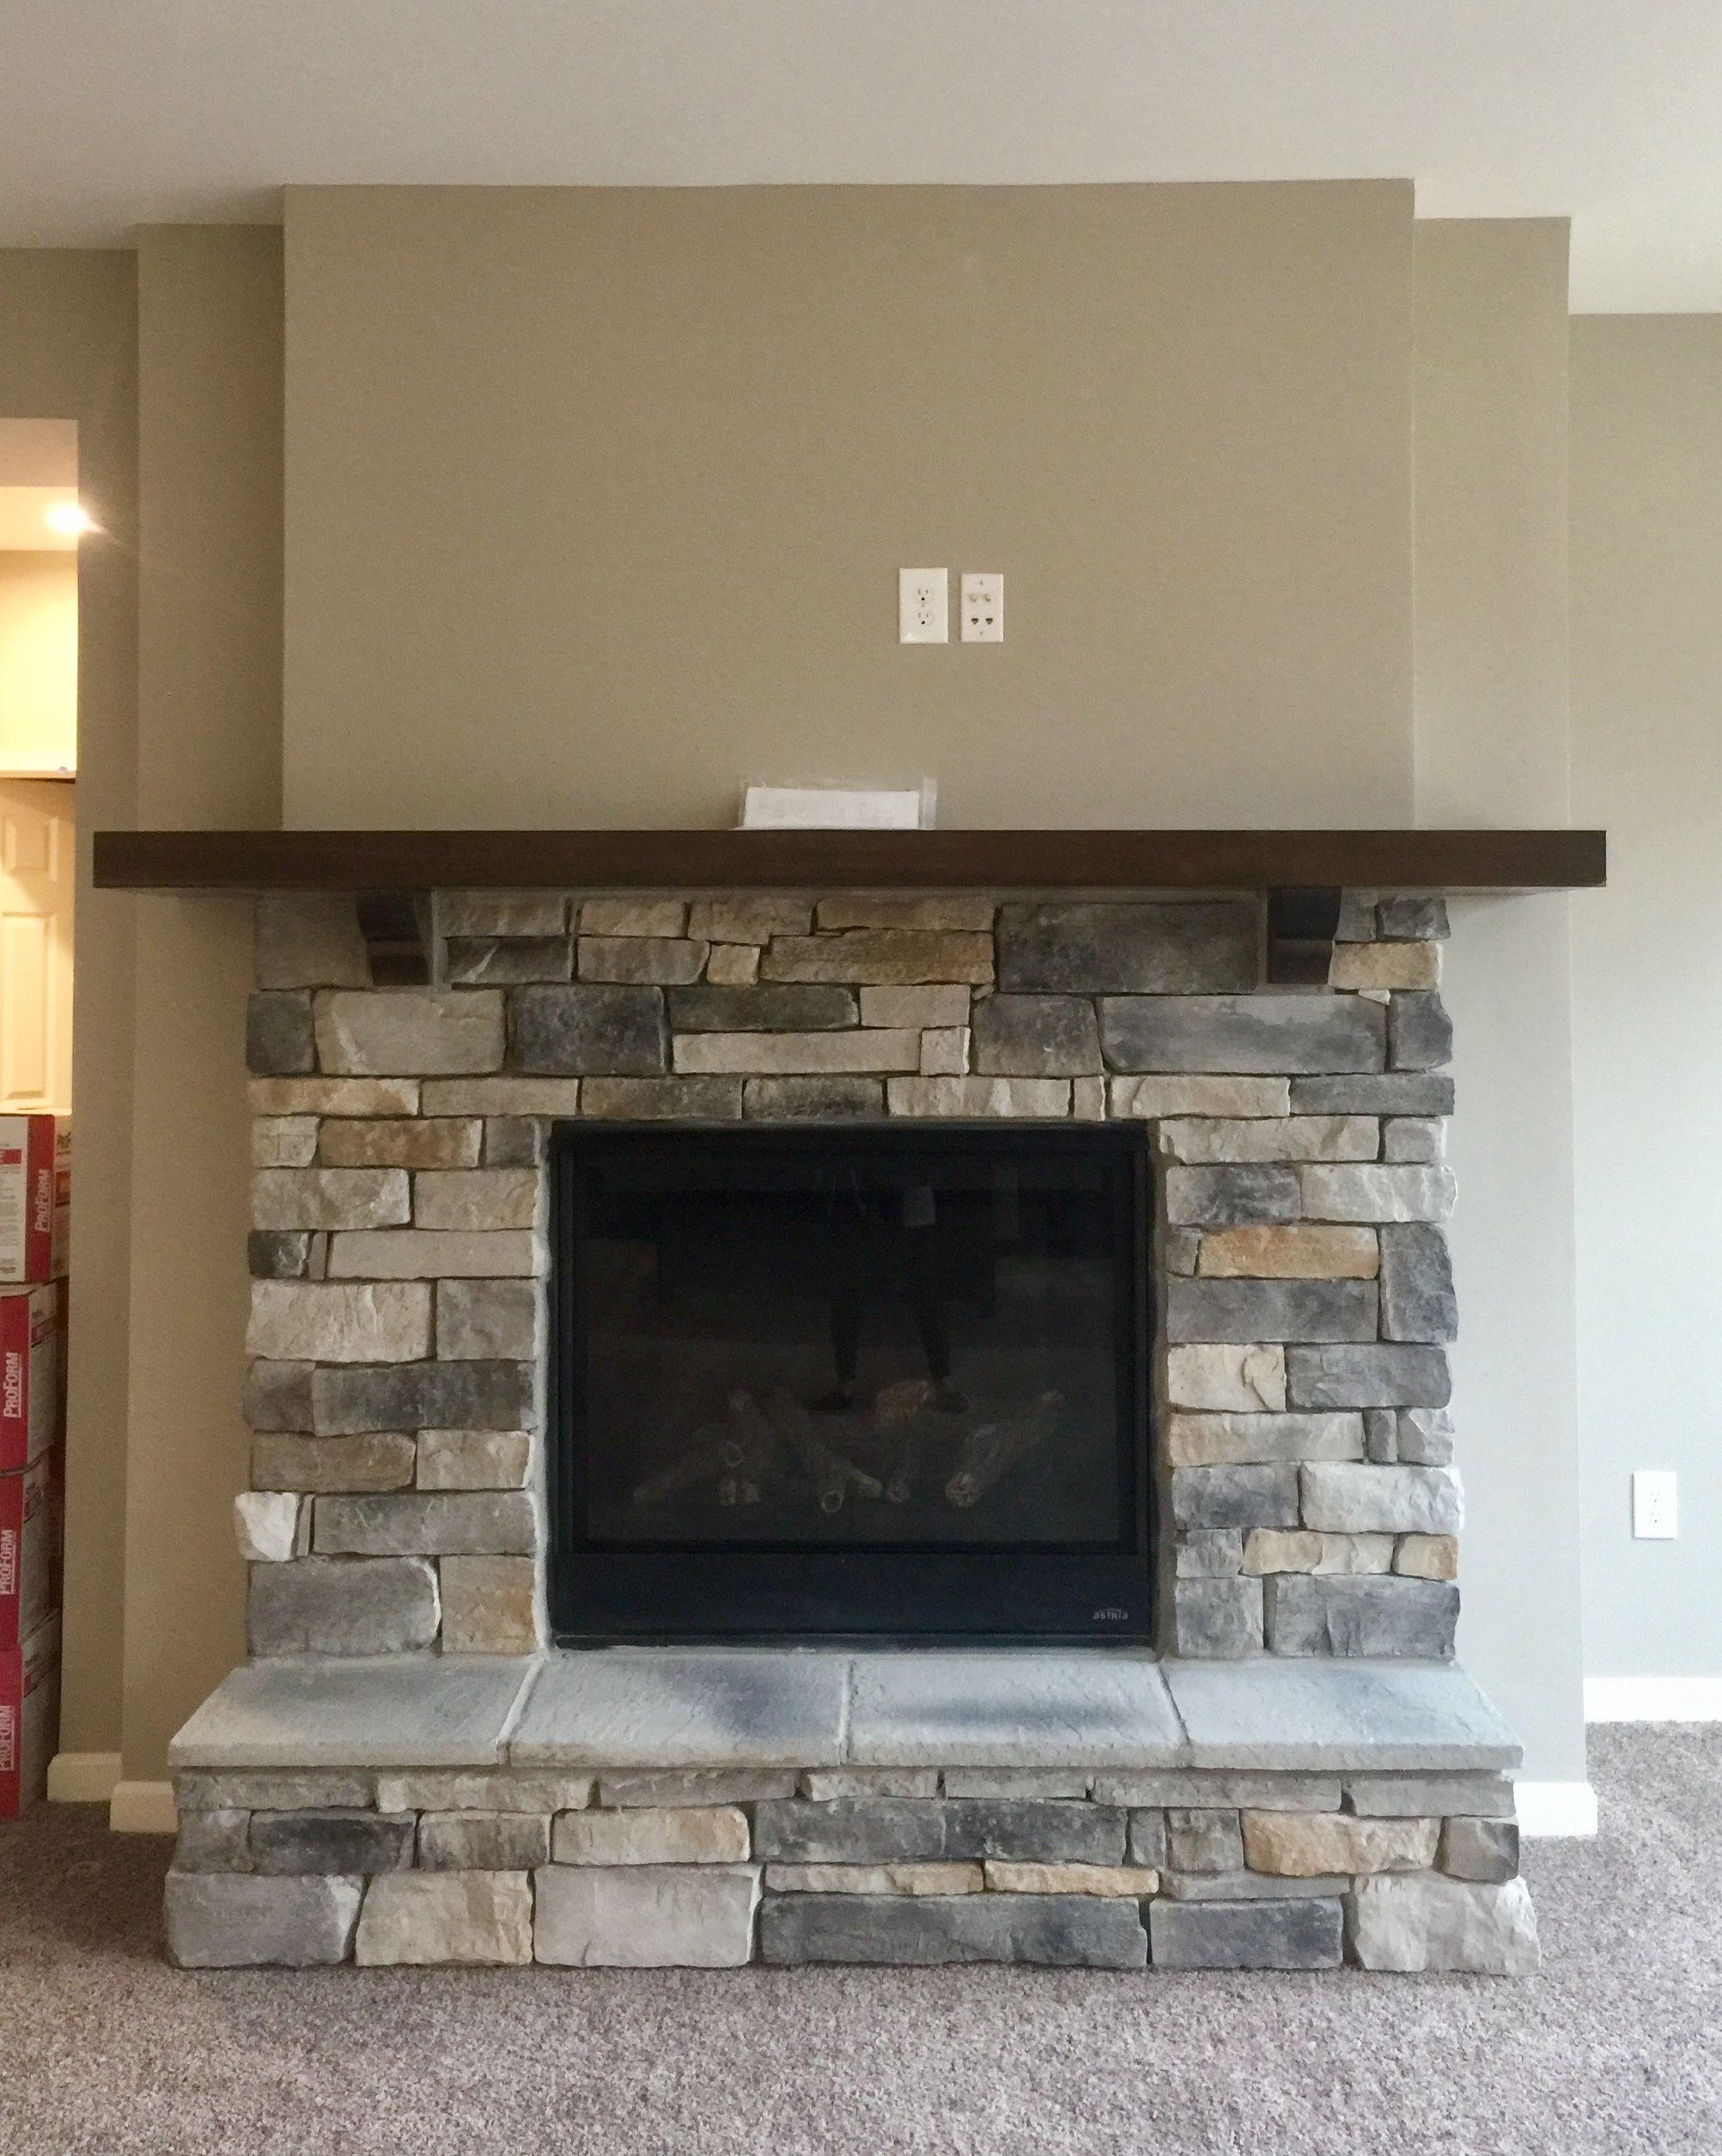 Customer Fireplace Prestige Weather Ledge Stone No Stone Above